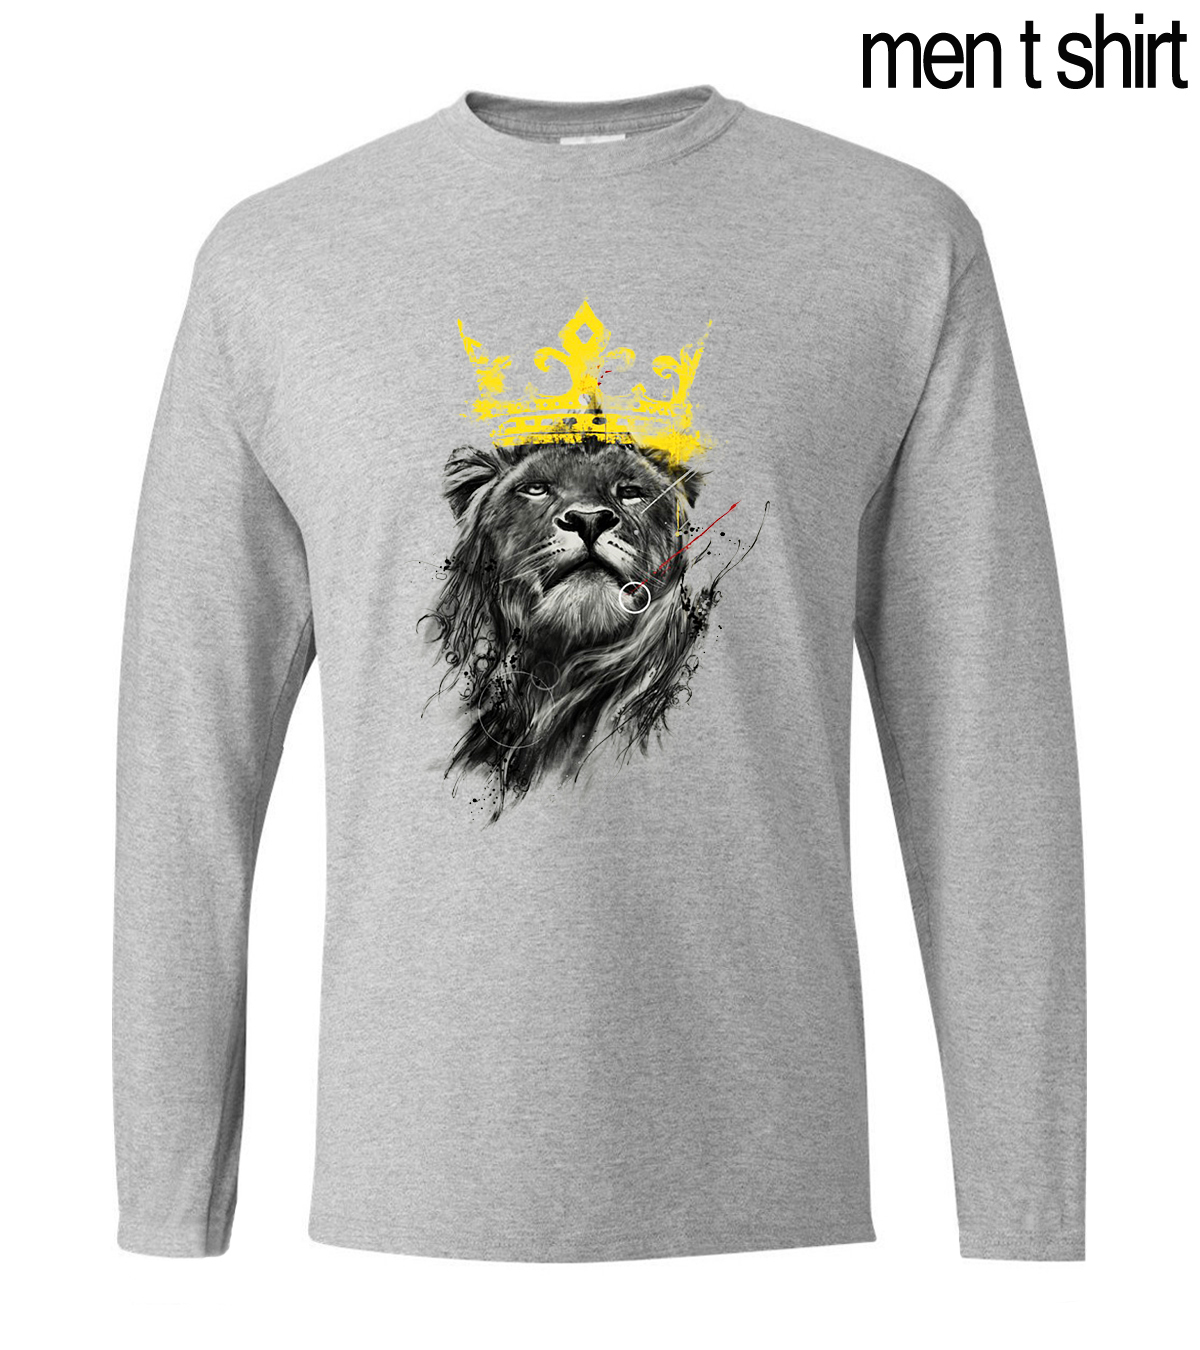 3D Print King Of Lion Men T Shirt 2019 Summer Long Sleeve Anime T-Shirt 100% Cotton High Quality Men's Tshirt Slim Fit Cool Tops